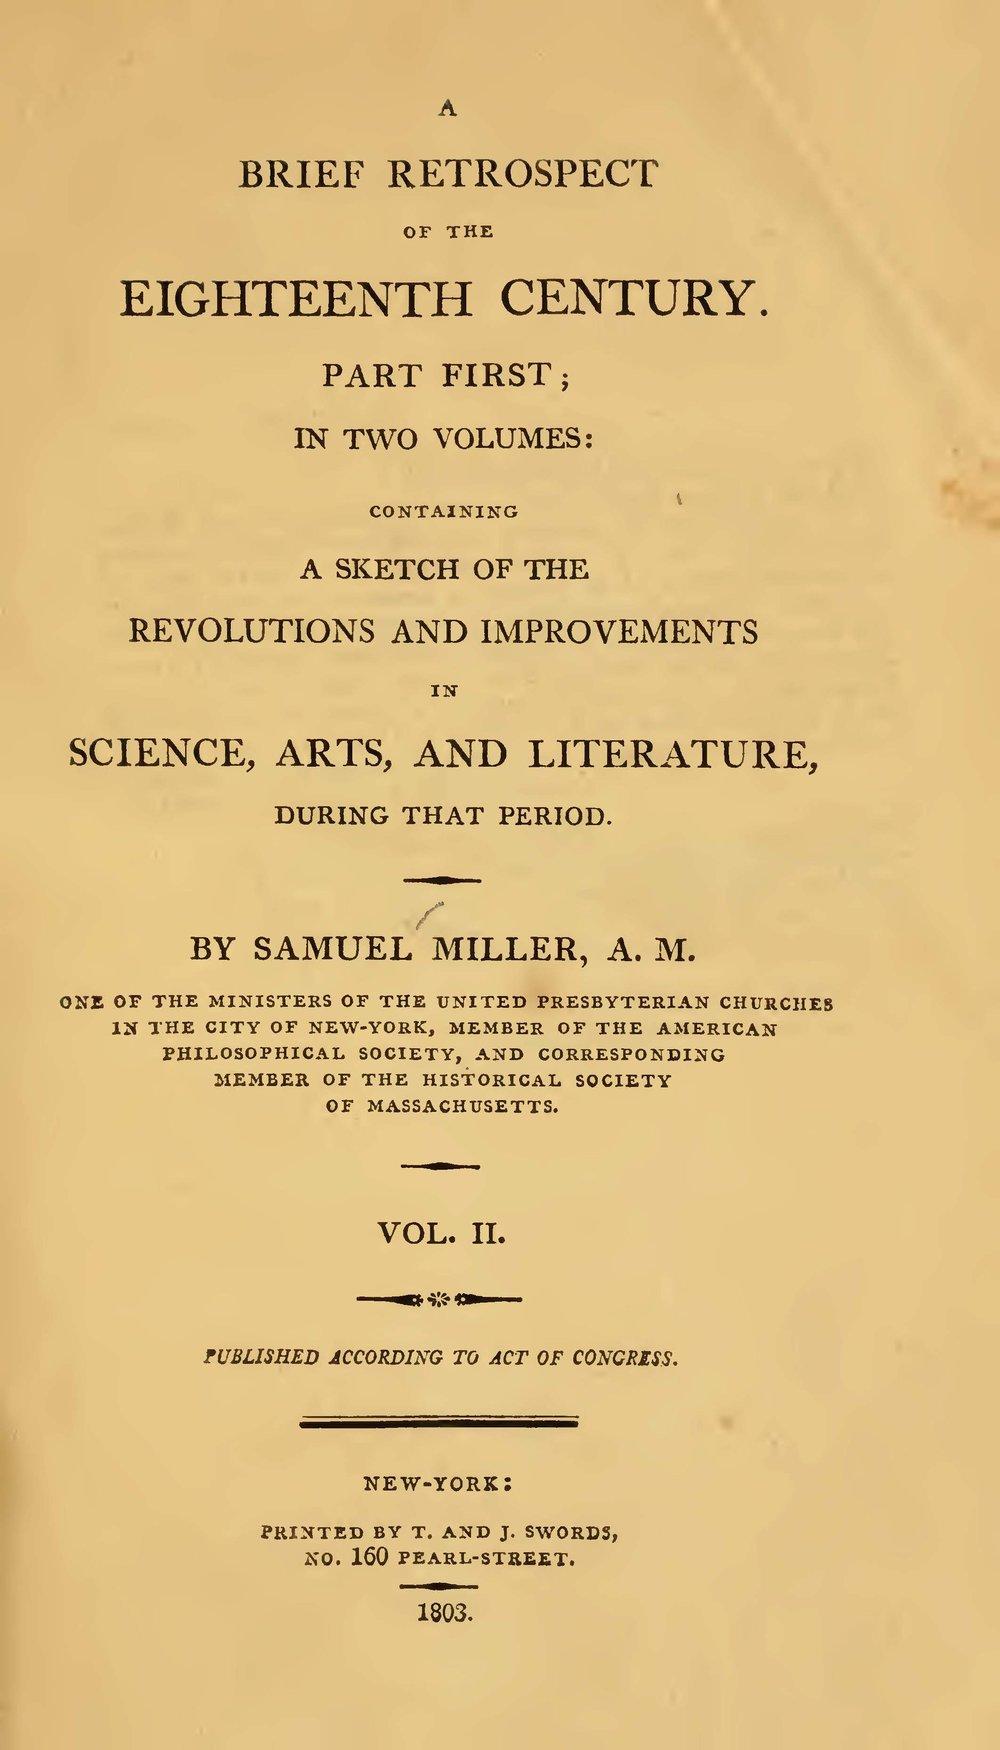 Miller, Samuel, A Brief Retrospect of the Eighteenth Century, Vol. 2 Title Page.jpg